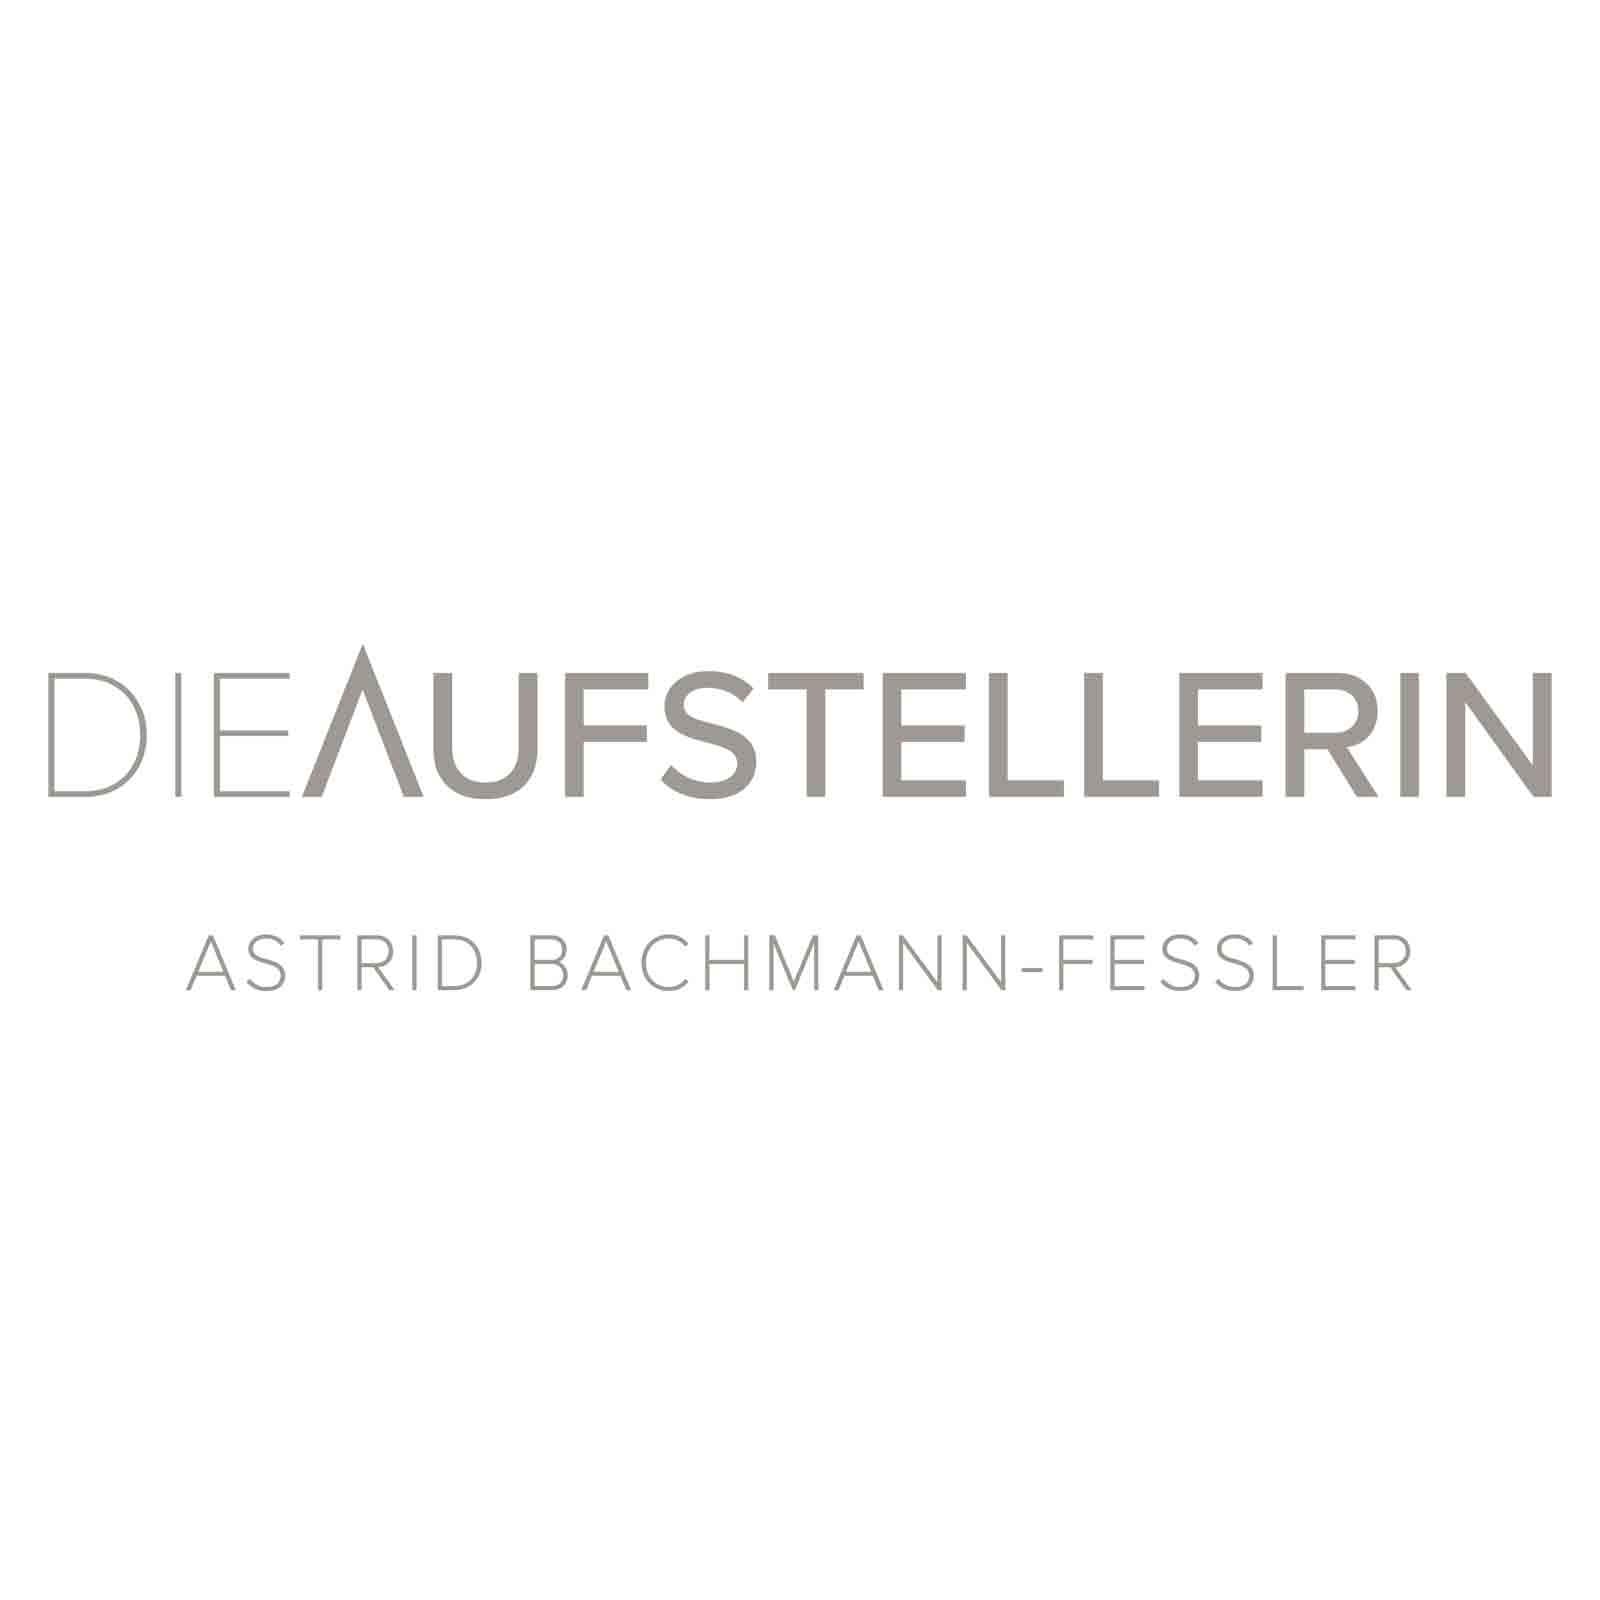 Die Aufstellerin Astrid Bachmann Fessler Webdesign Basel Webagentur Webdesign ShowMyProject Basel